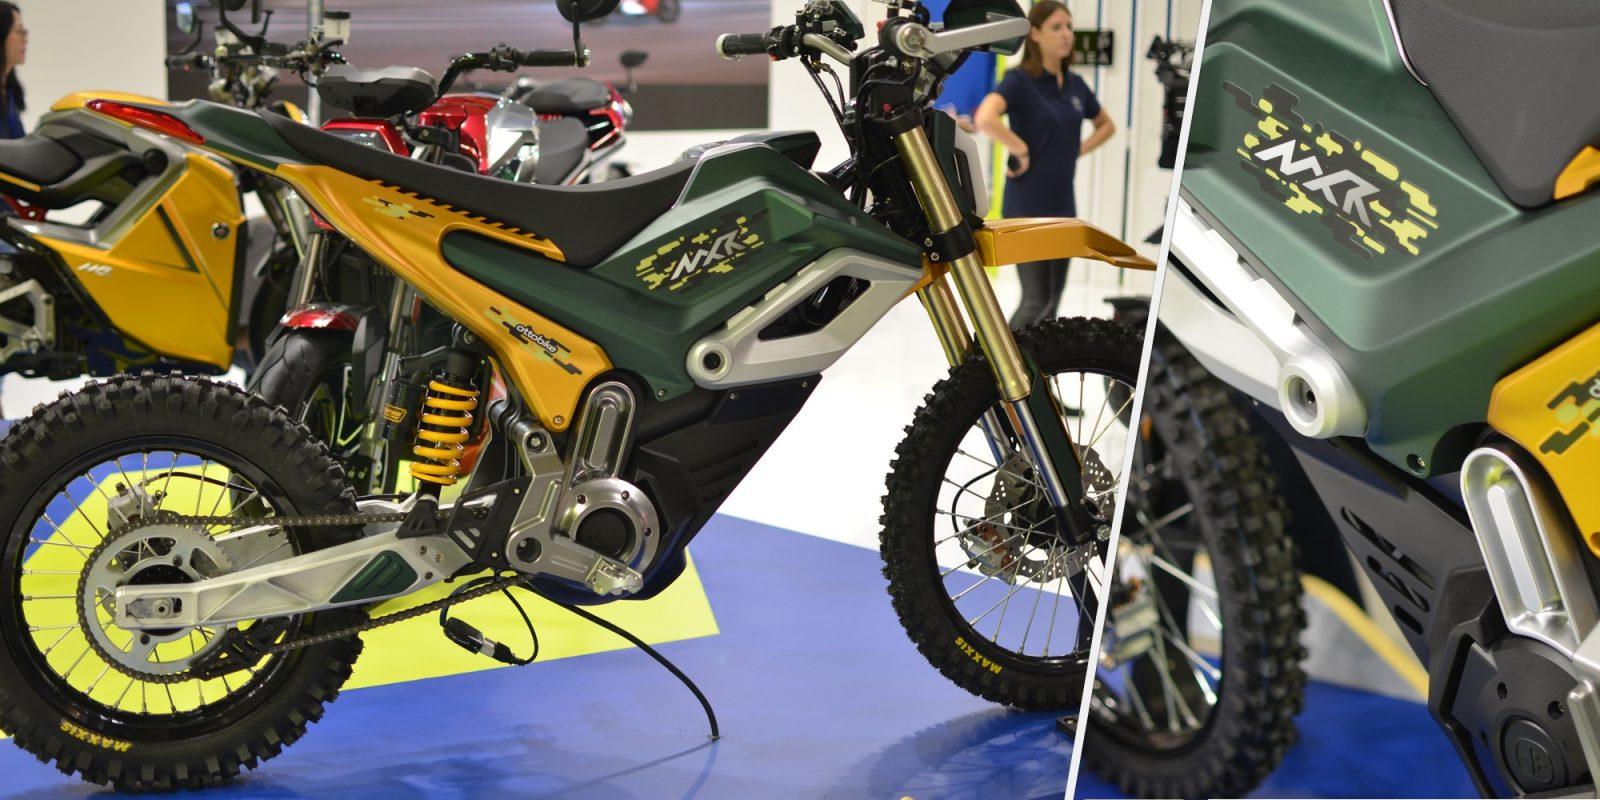 Ottobike unveils impressive 75 MPH (120 km/h) electric dirt bike for 2020